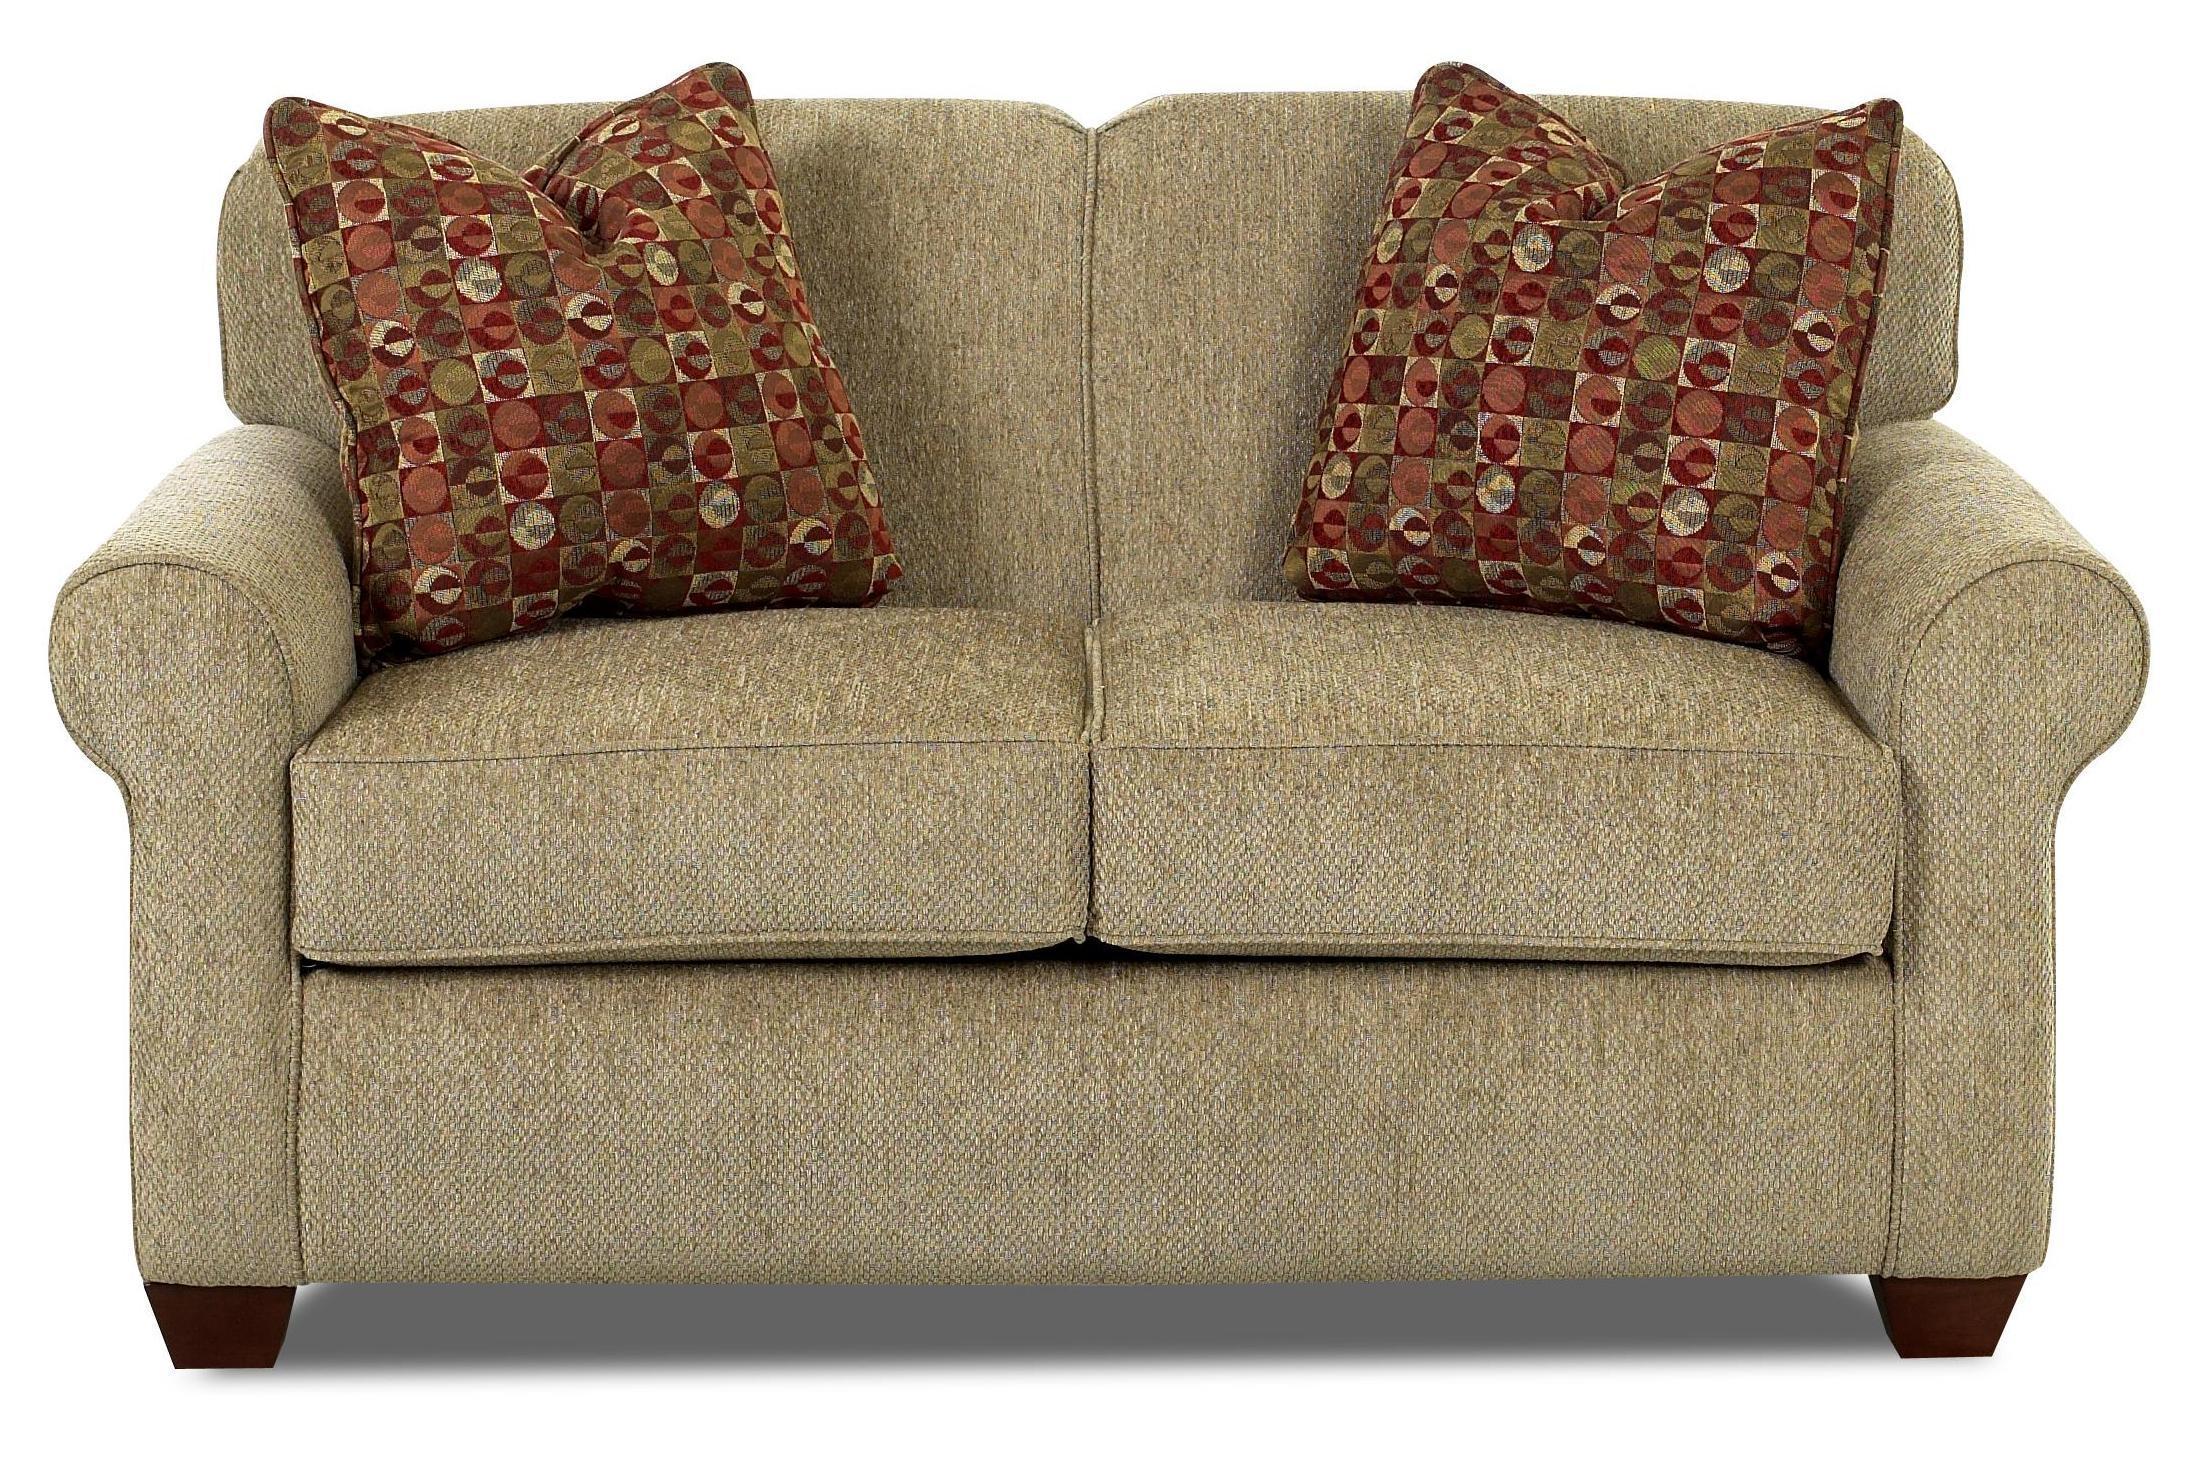 american leather full sleeper sofa felix lh corner chaise 20 top craigslist sofas ideas